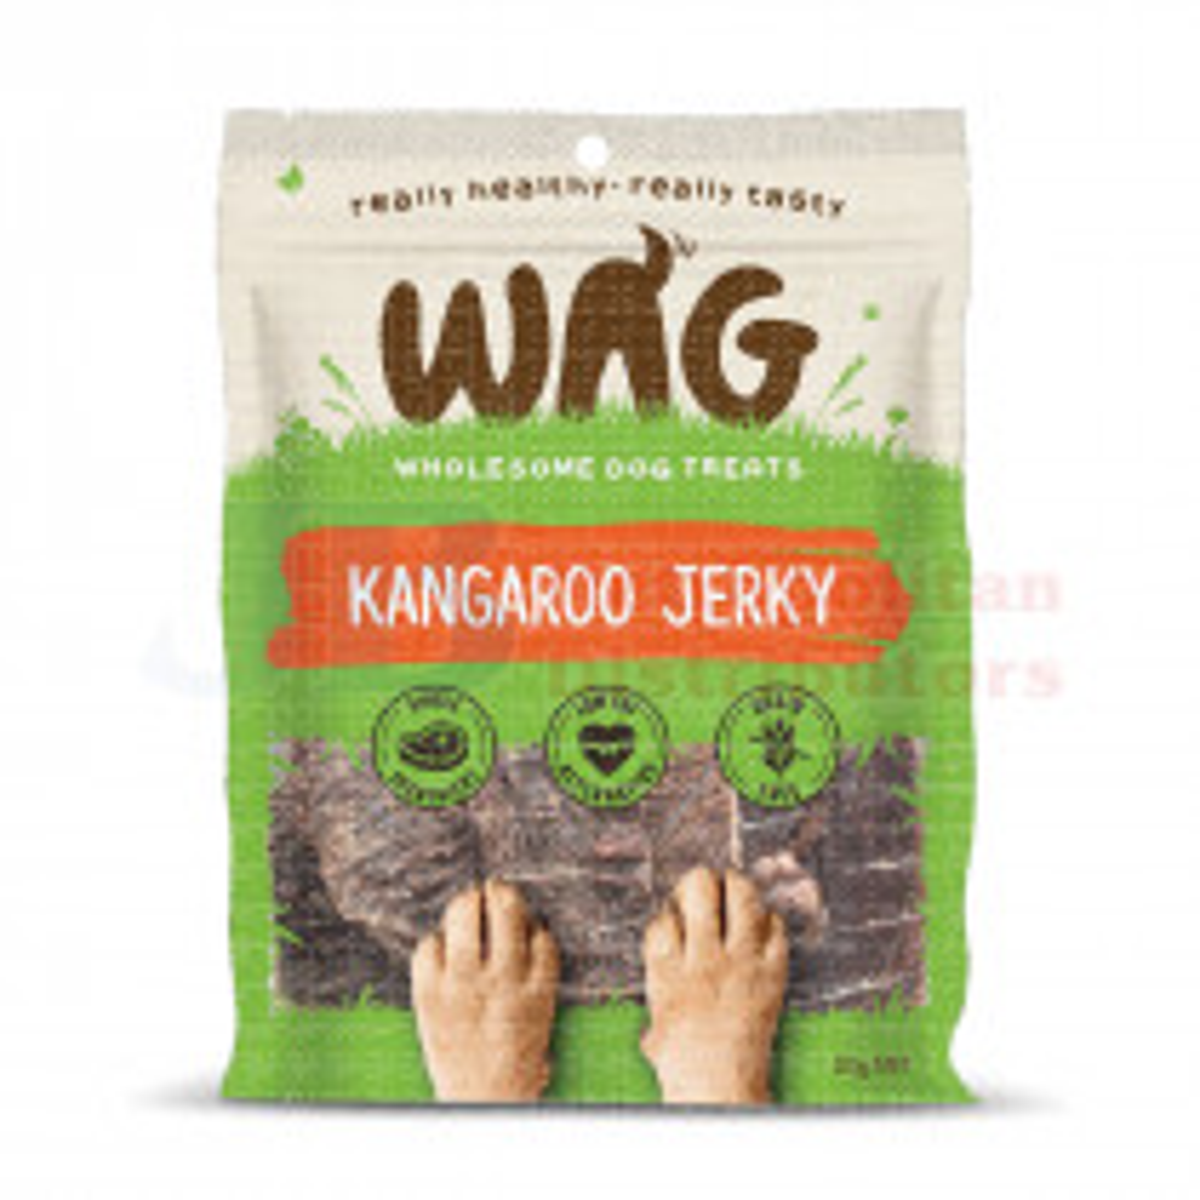 50G WAG KANGAROO JERKY